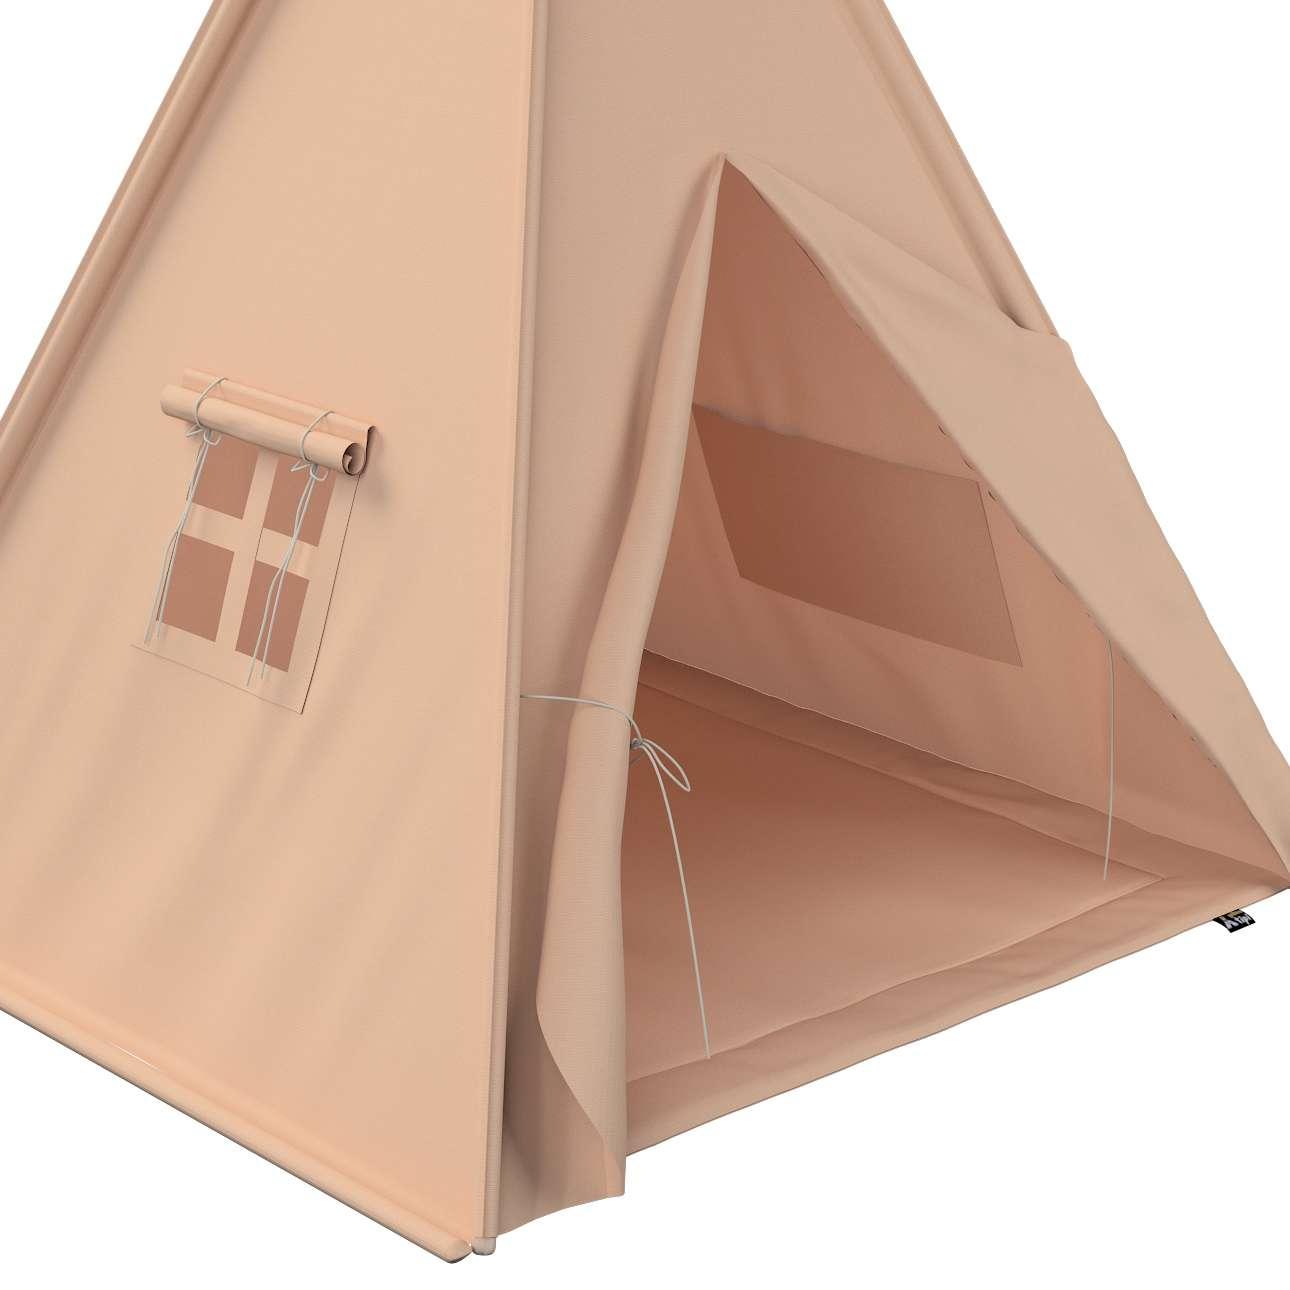 Tipi-Zelt von der Kollektion Cotton Story, Stoff: 702-01